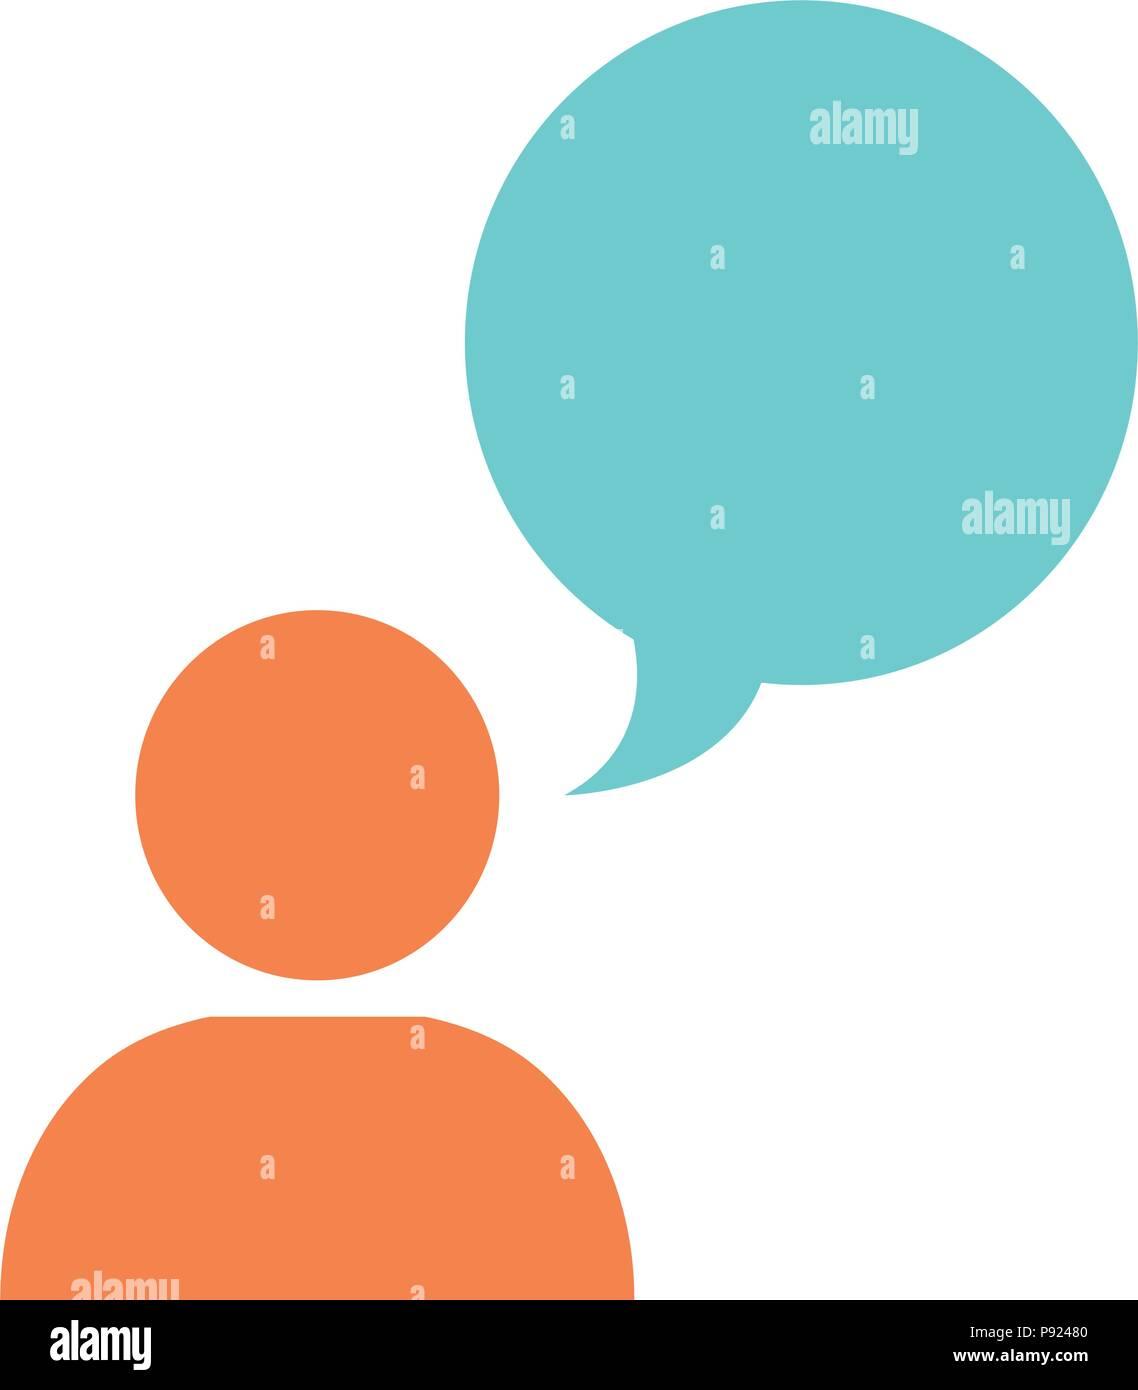 Intercommunication Stock Photos Images Intercom Circuit User Silhouette With Speech Bubble Image